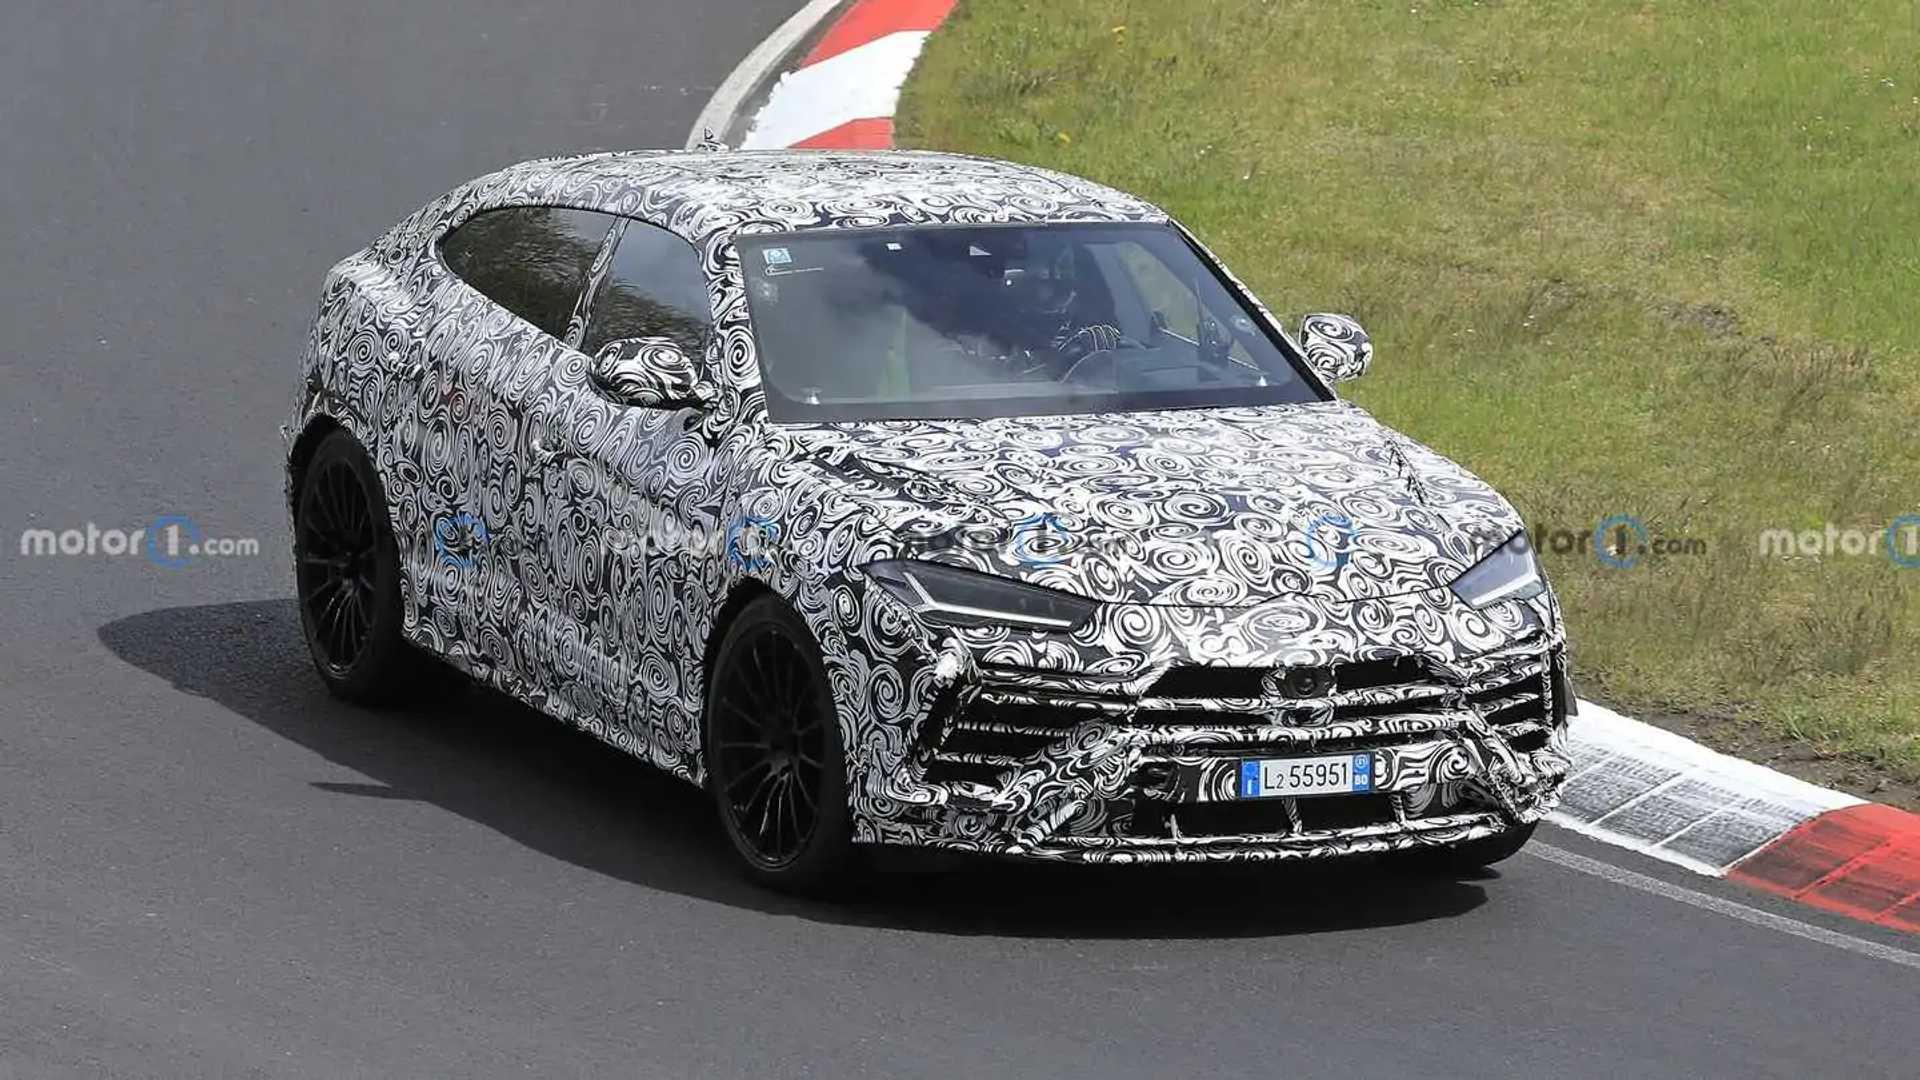 Lamborghini Urus Evo Spied Looking Fast On The Nurburgring